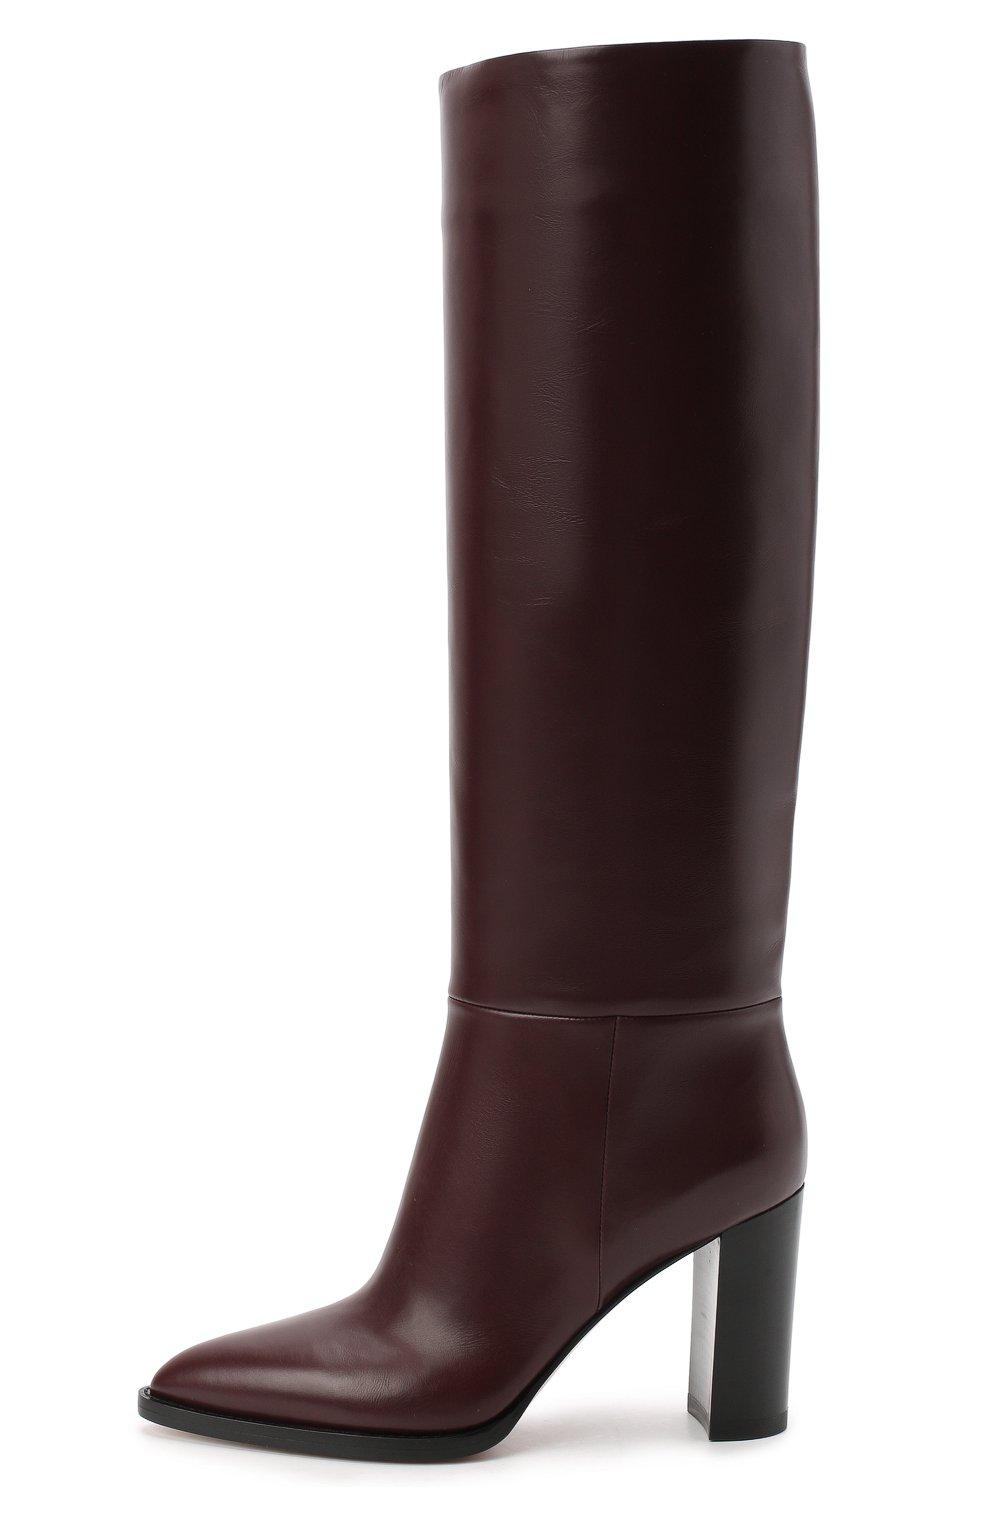 Женские кожаные сапоги daywear GIANVITO ROSSI бордового цвета, арт. G80403.85CU0.VITR0YA | Фото 3